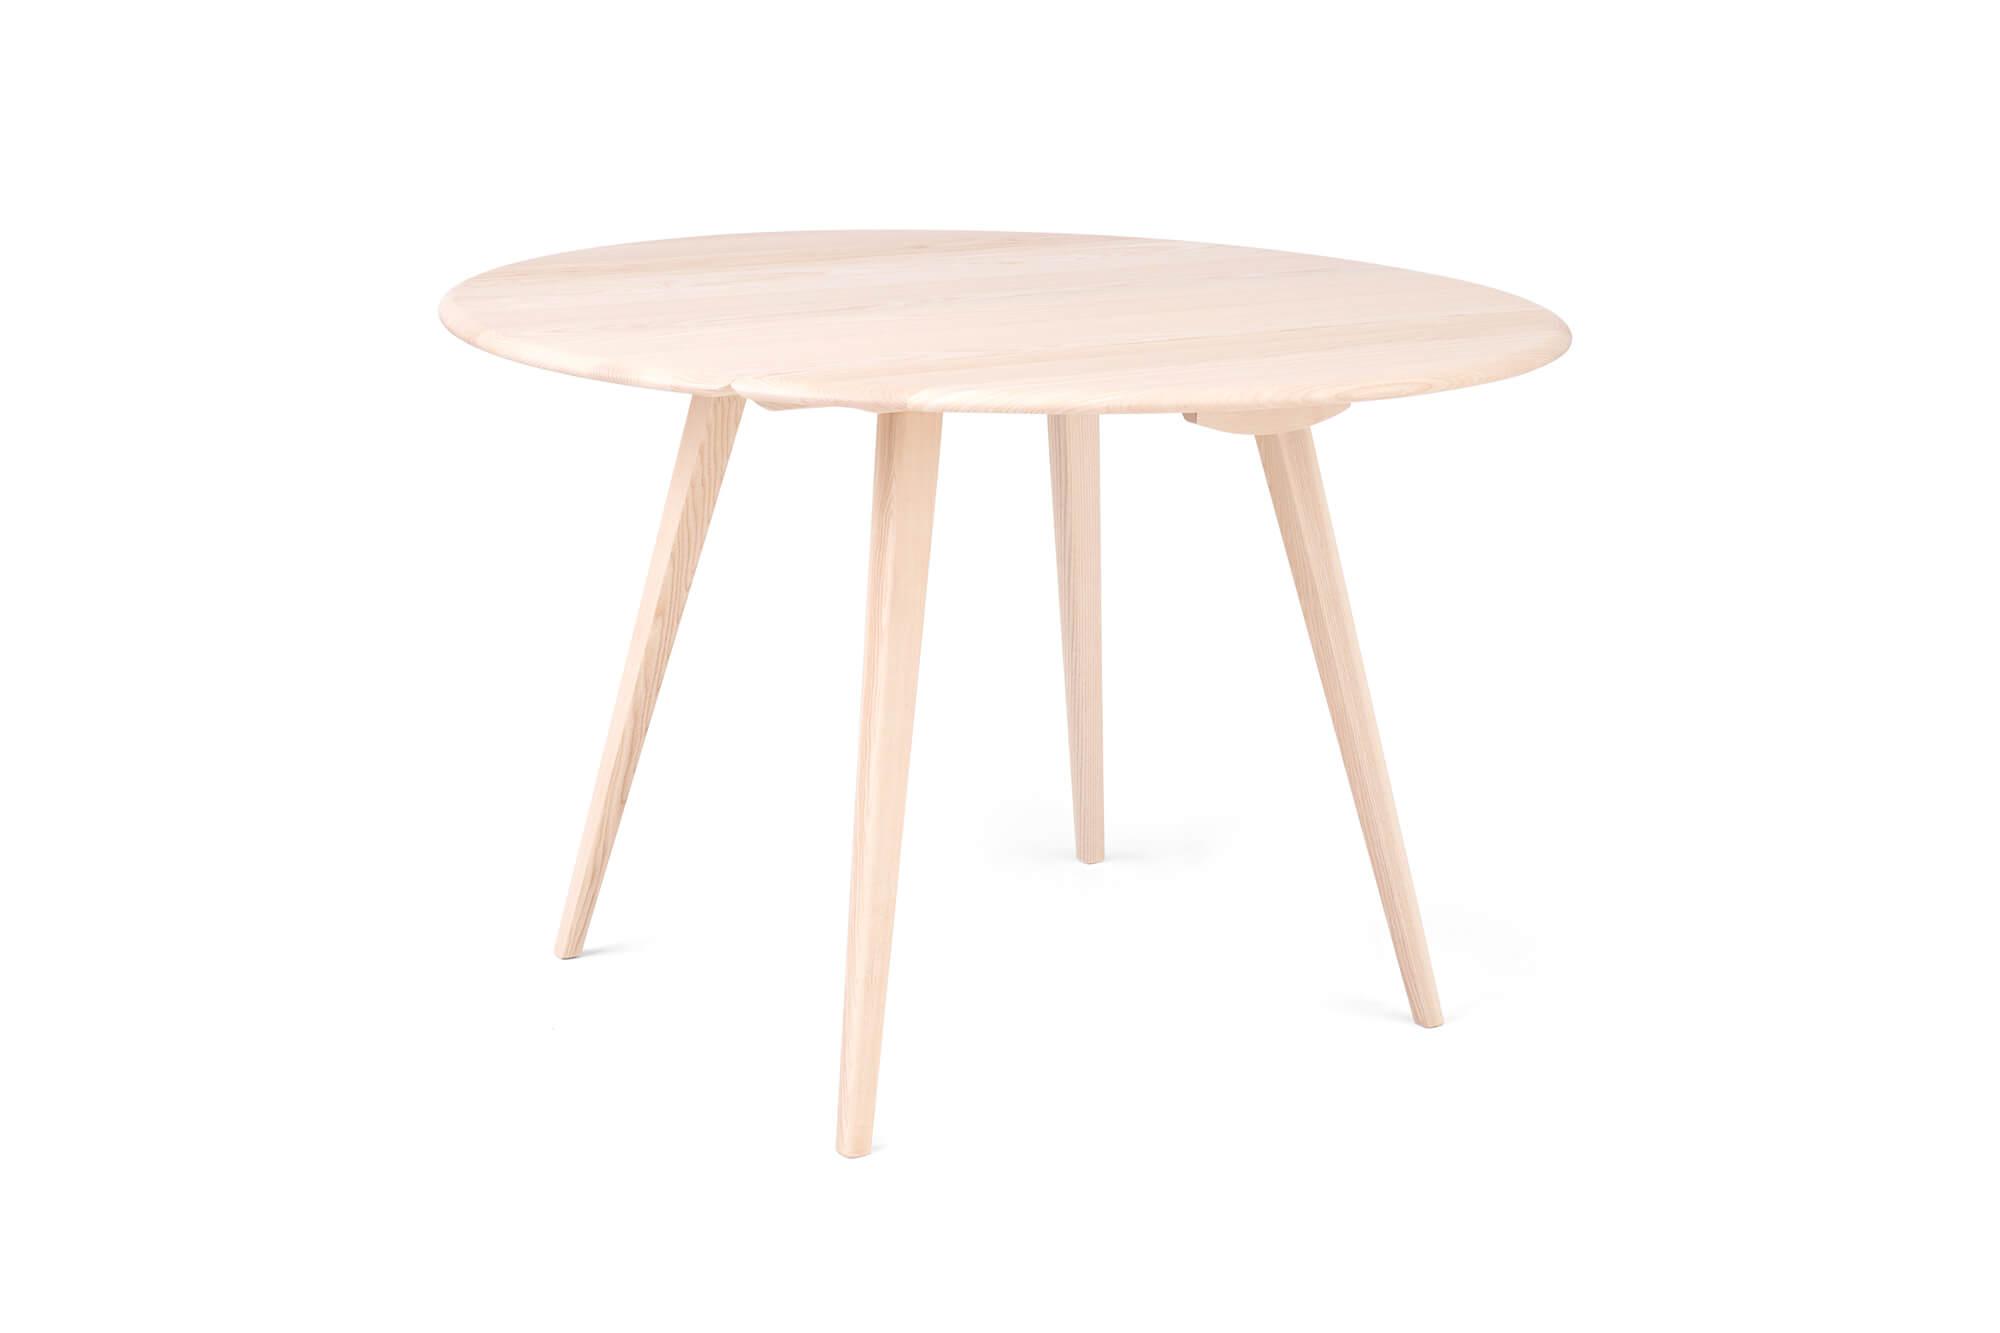 Originals Drop Leaf Dining Table